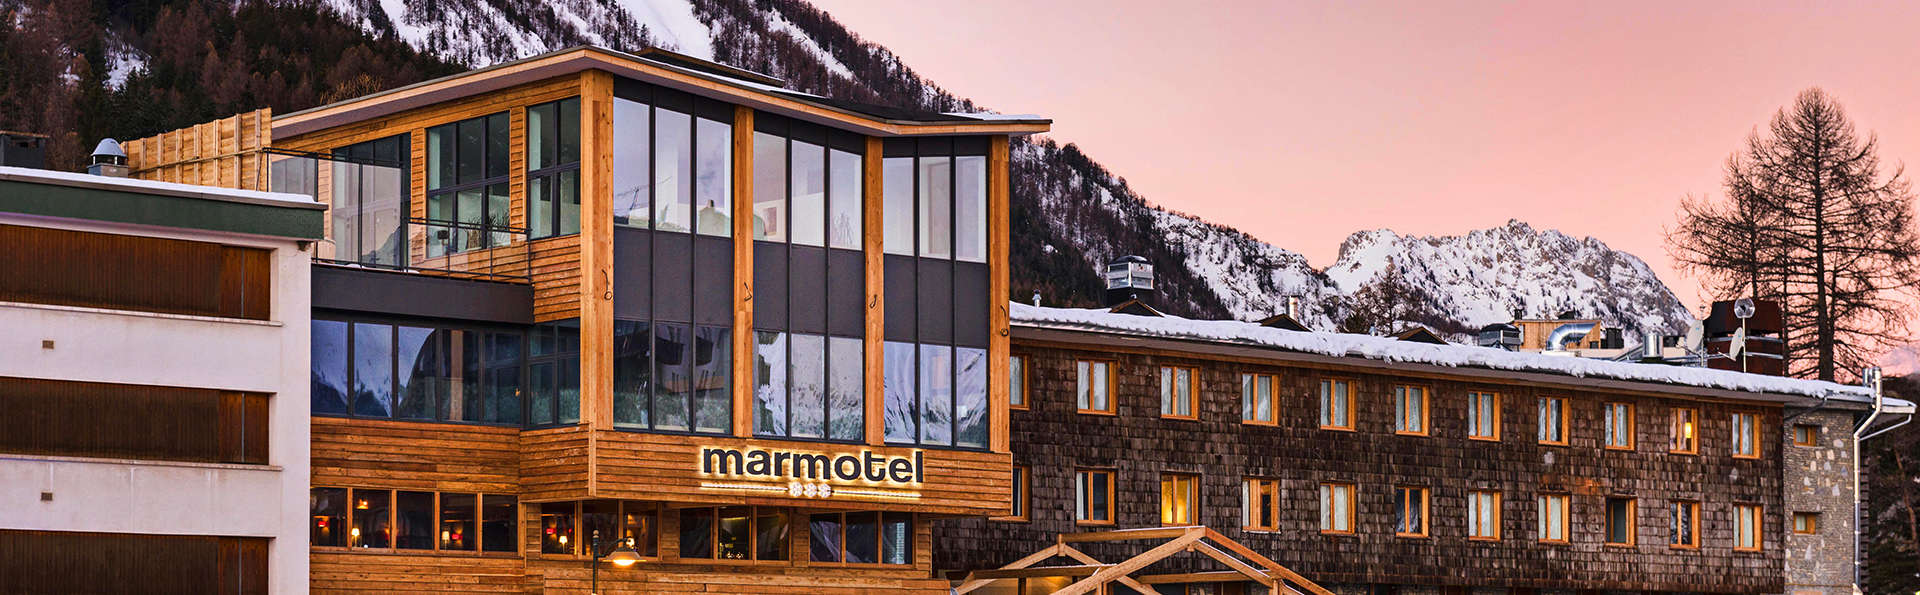 Marmotel - EDIT_Exterior2.jpg